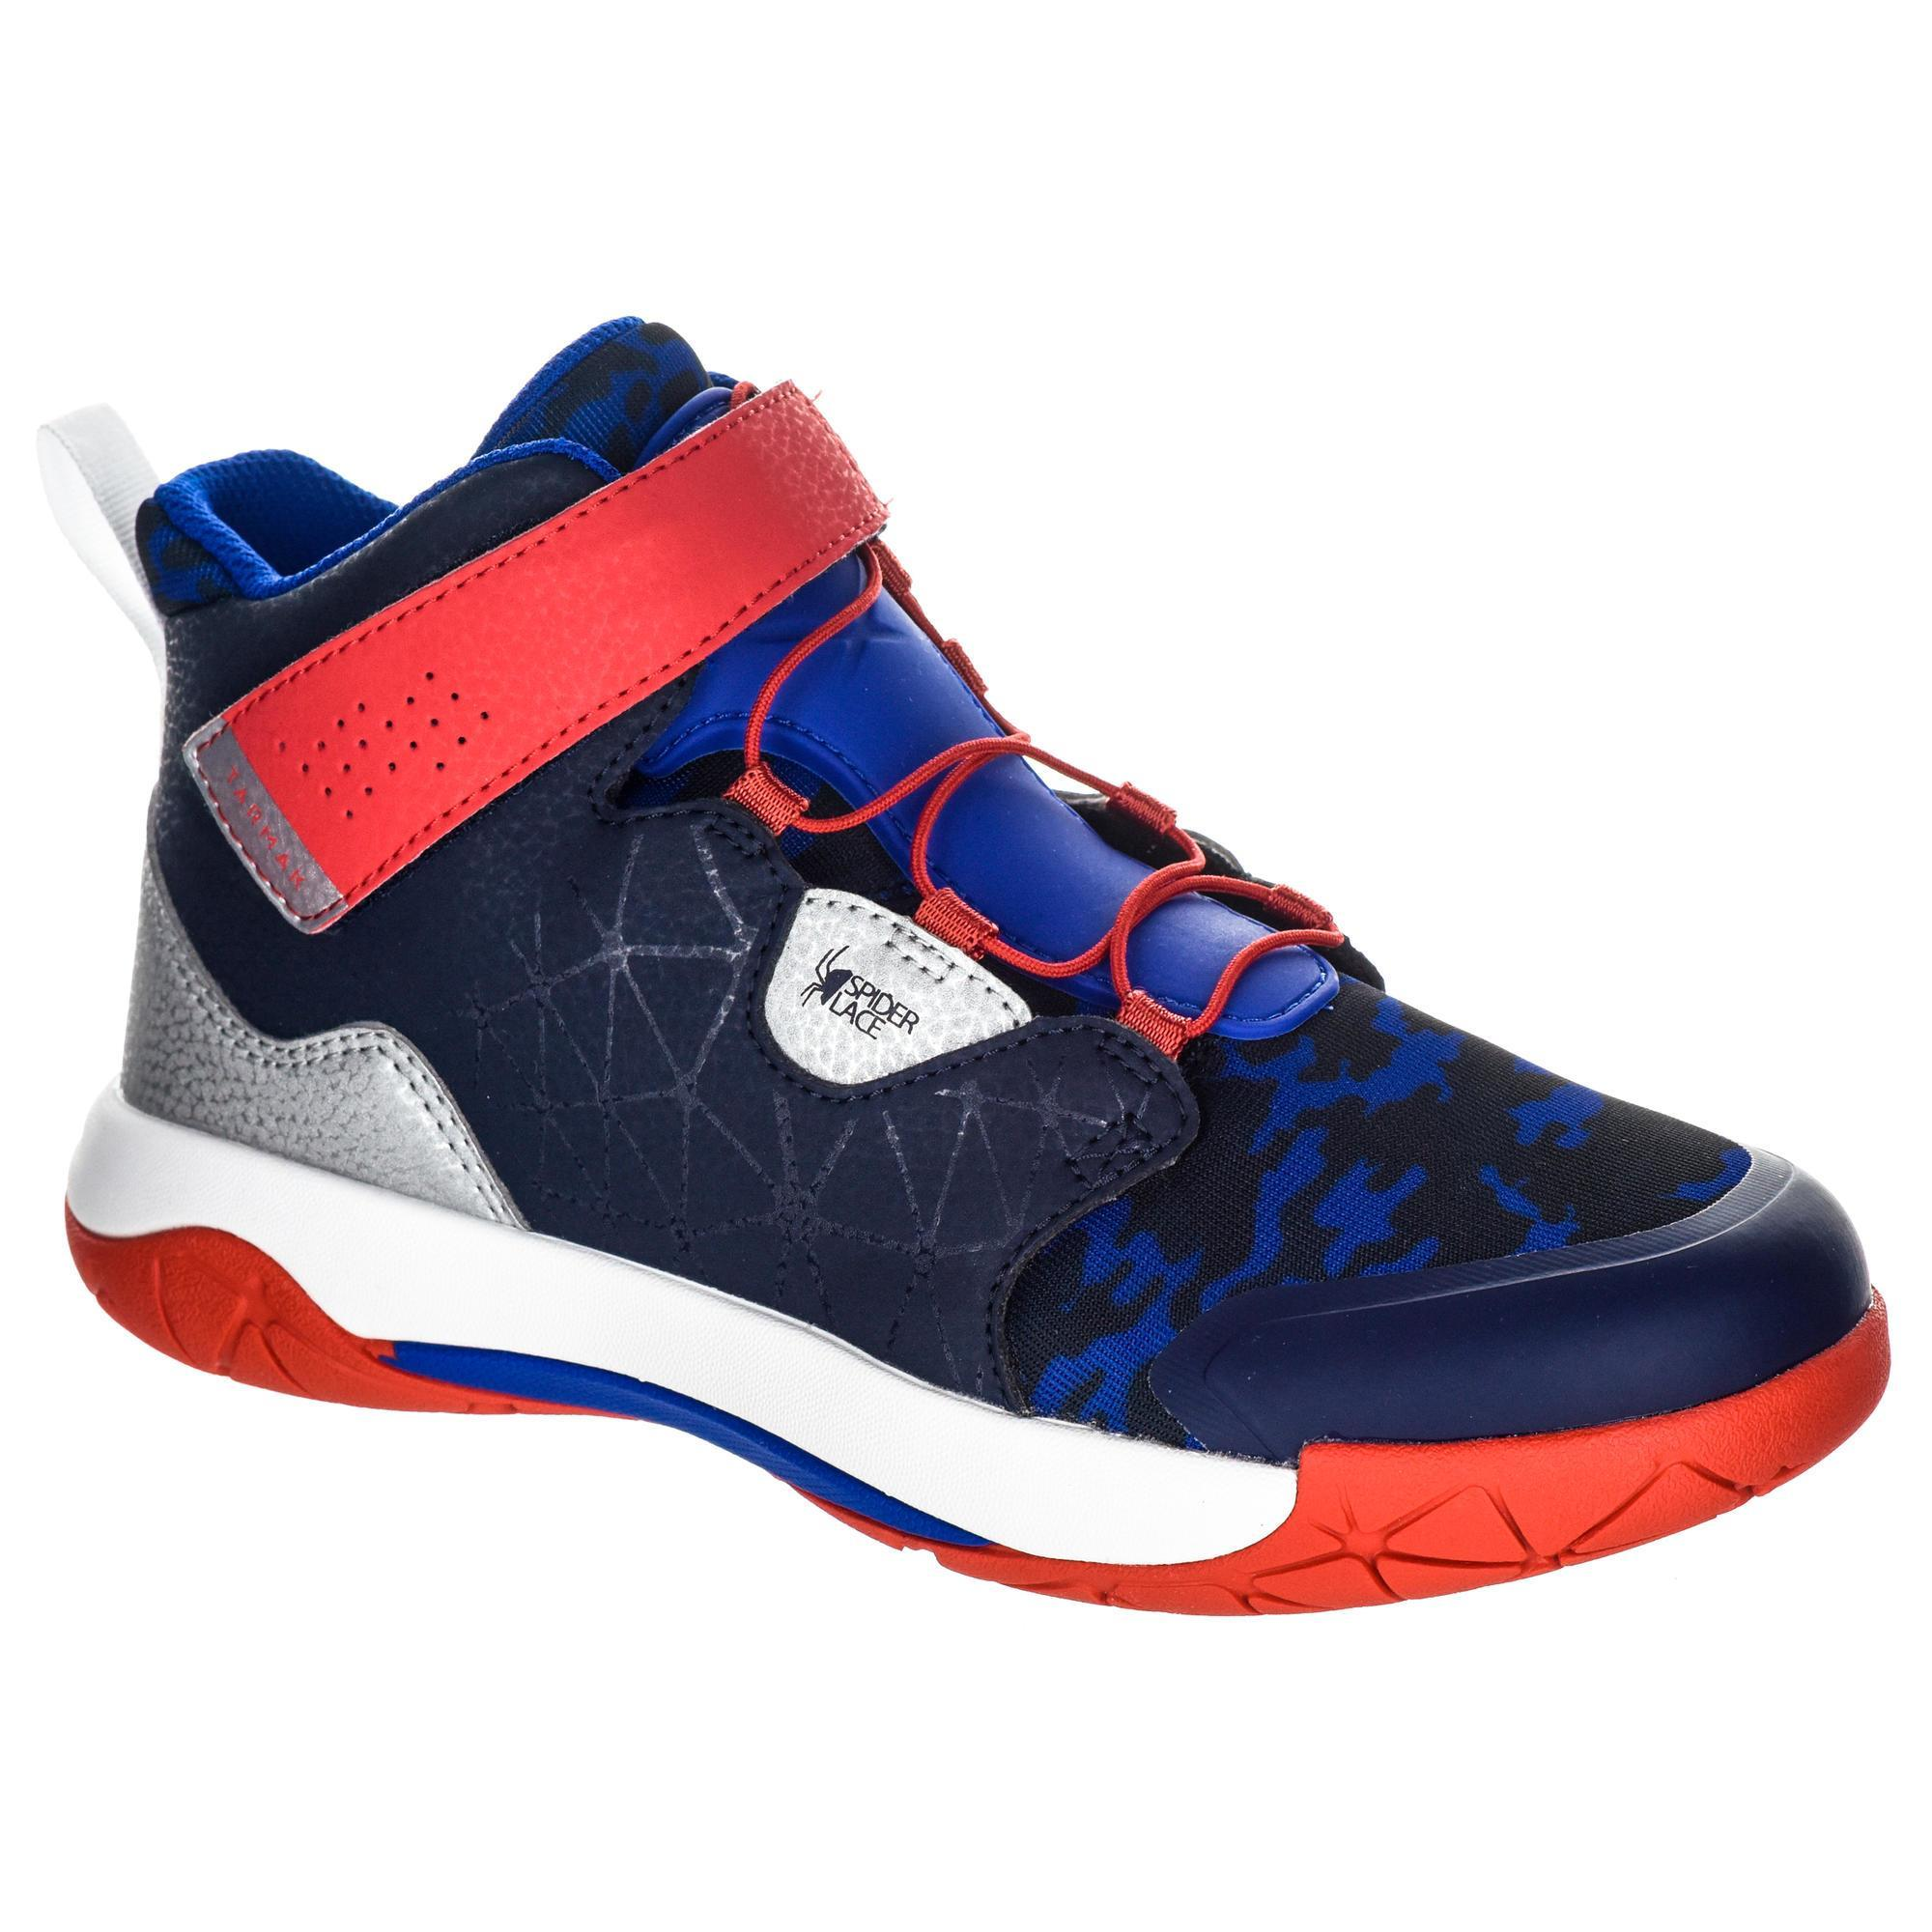 Tarmak Basketbalschoenen Spider Lace blauw/rood